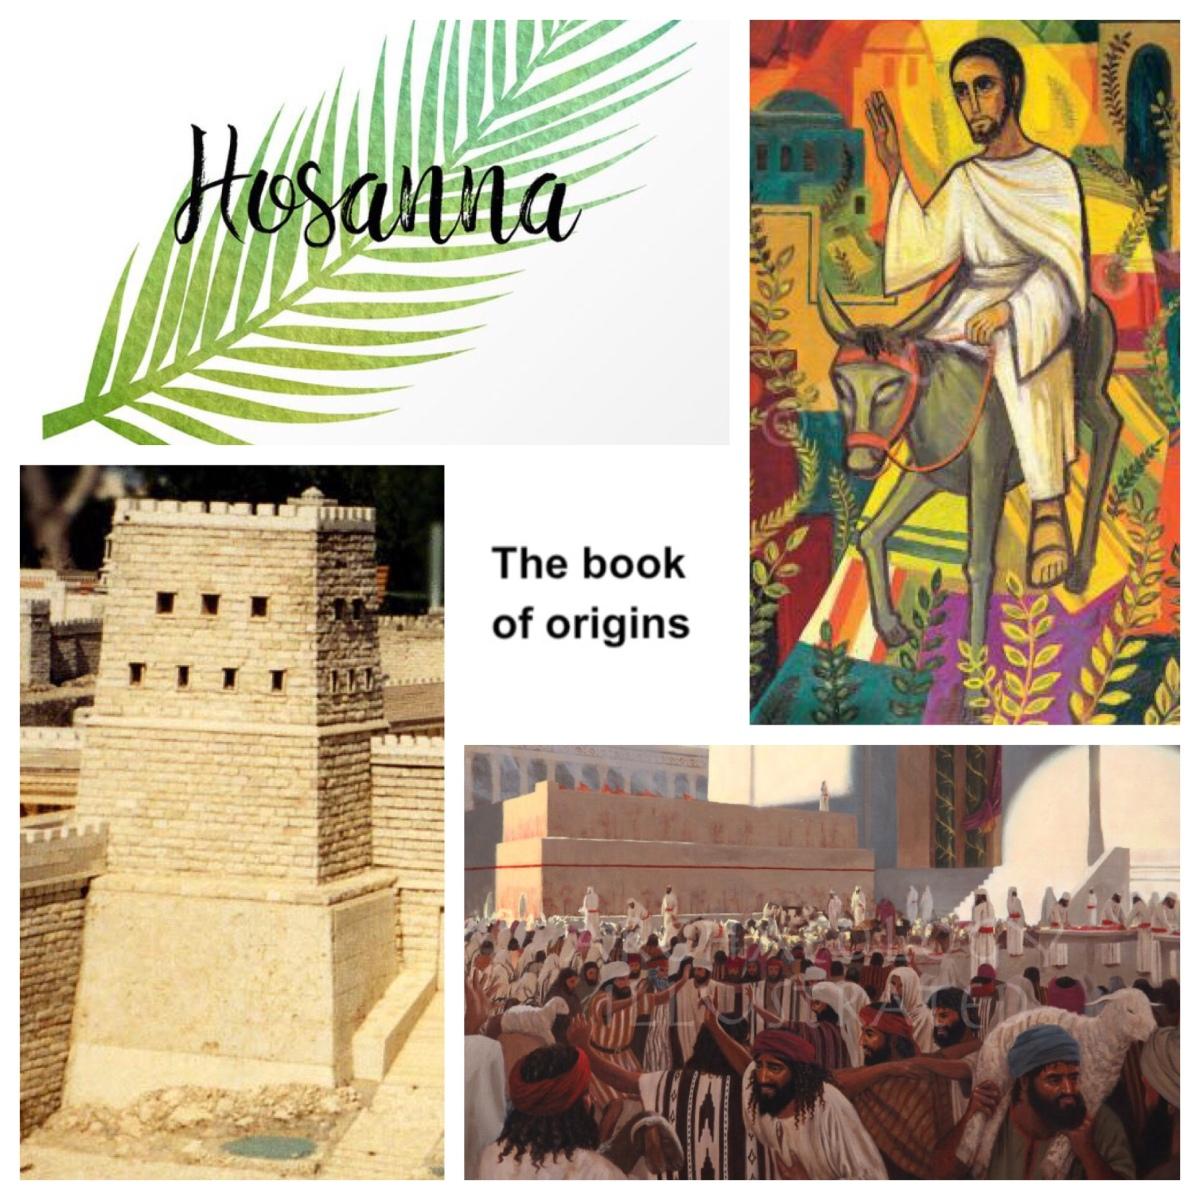 Towards Palm Sunday (Matt 21): Acclaiming the king, anticipating thekingdom